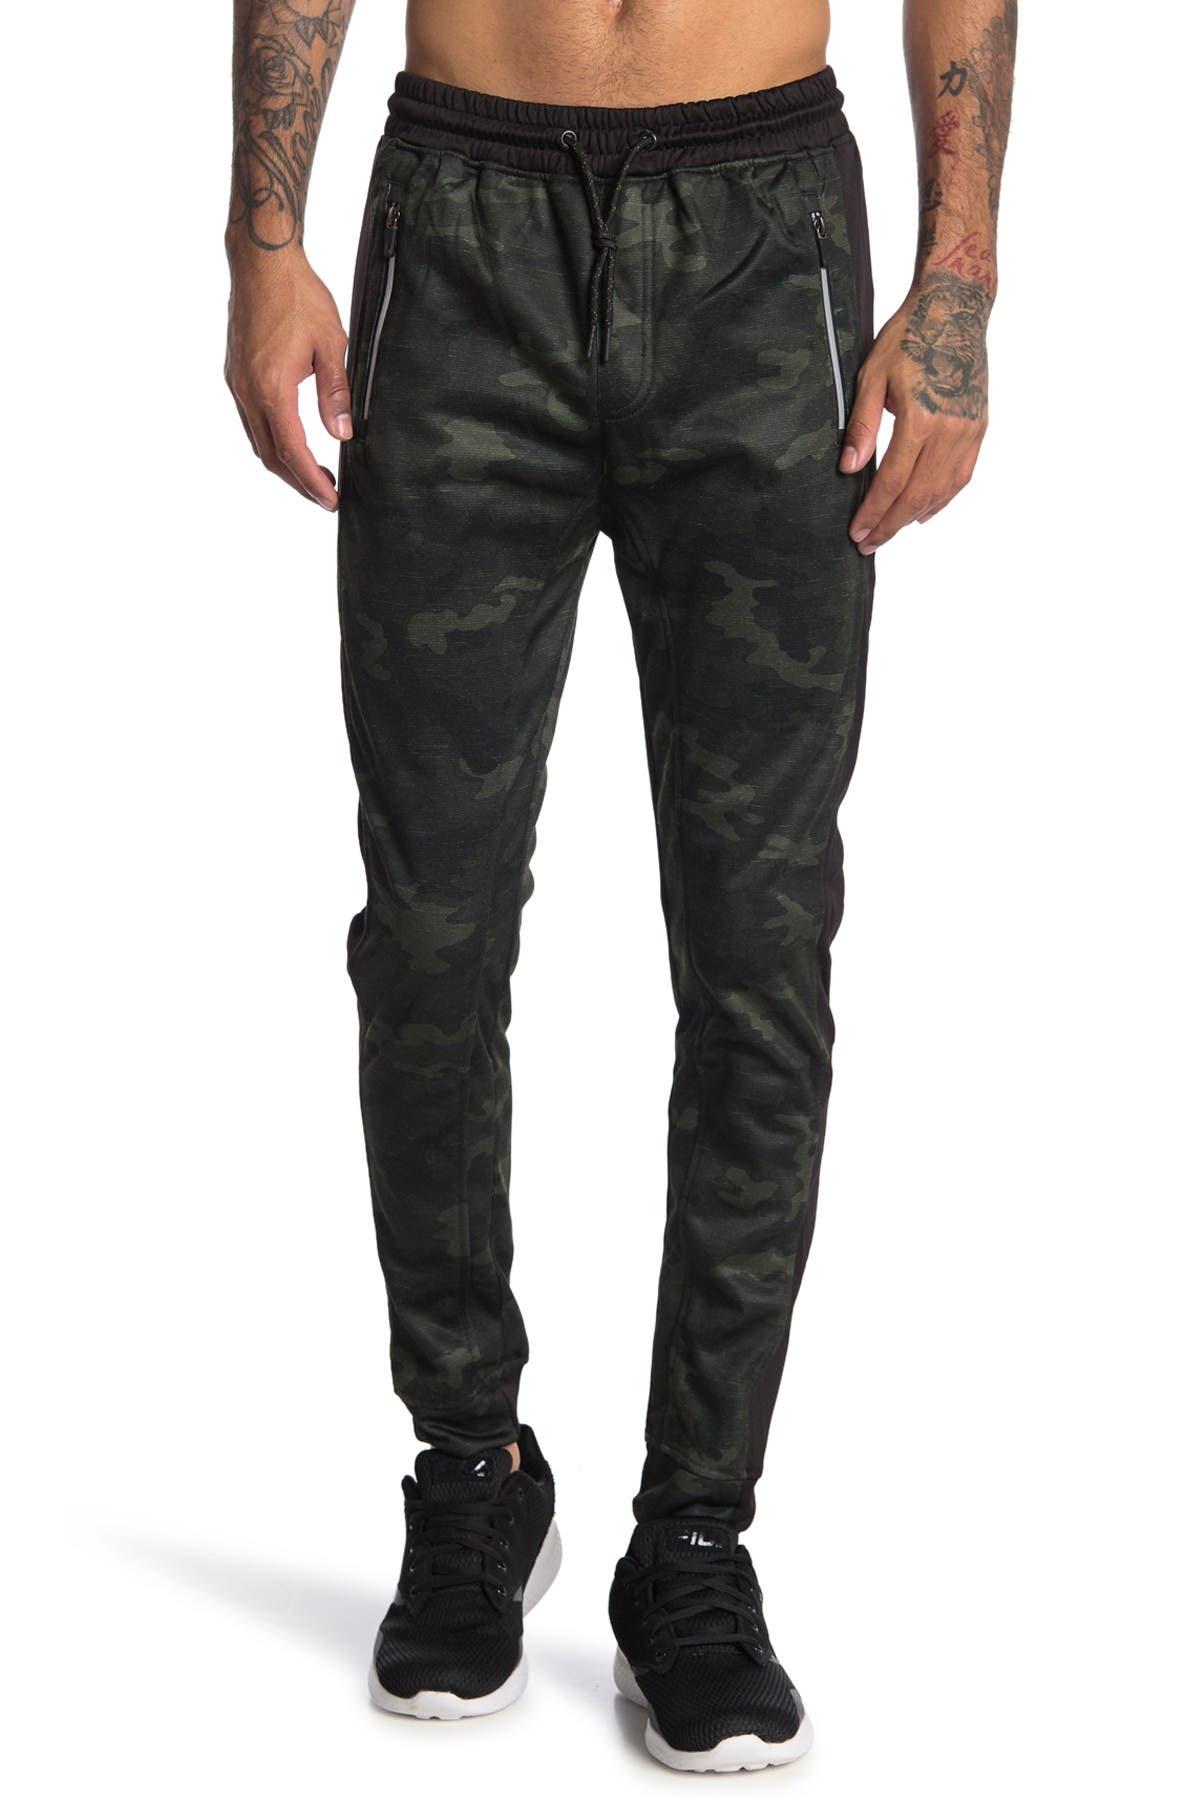 Image of Burnside Camo Print Zip Pocket Fleece Joggers